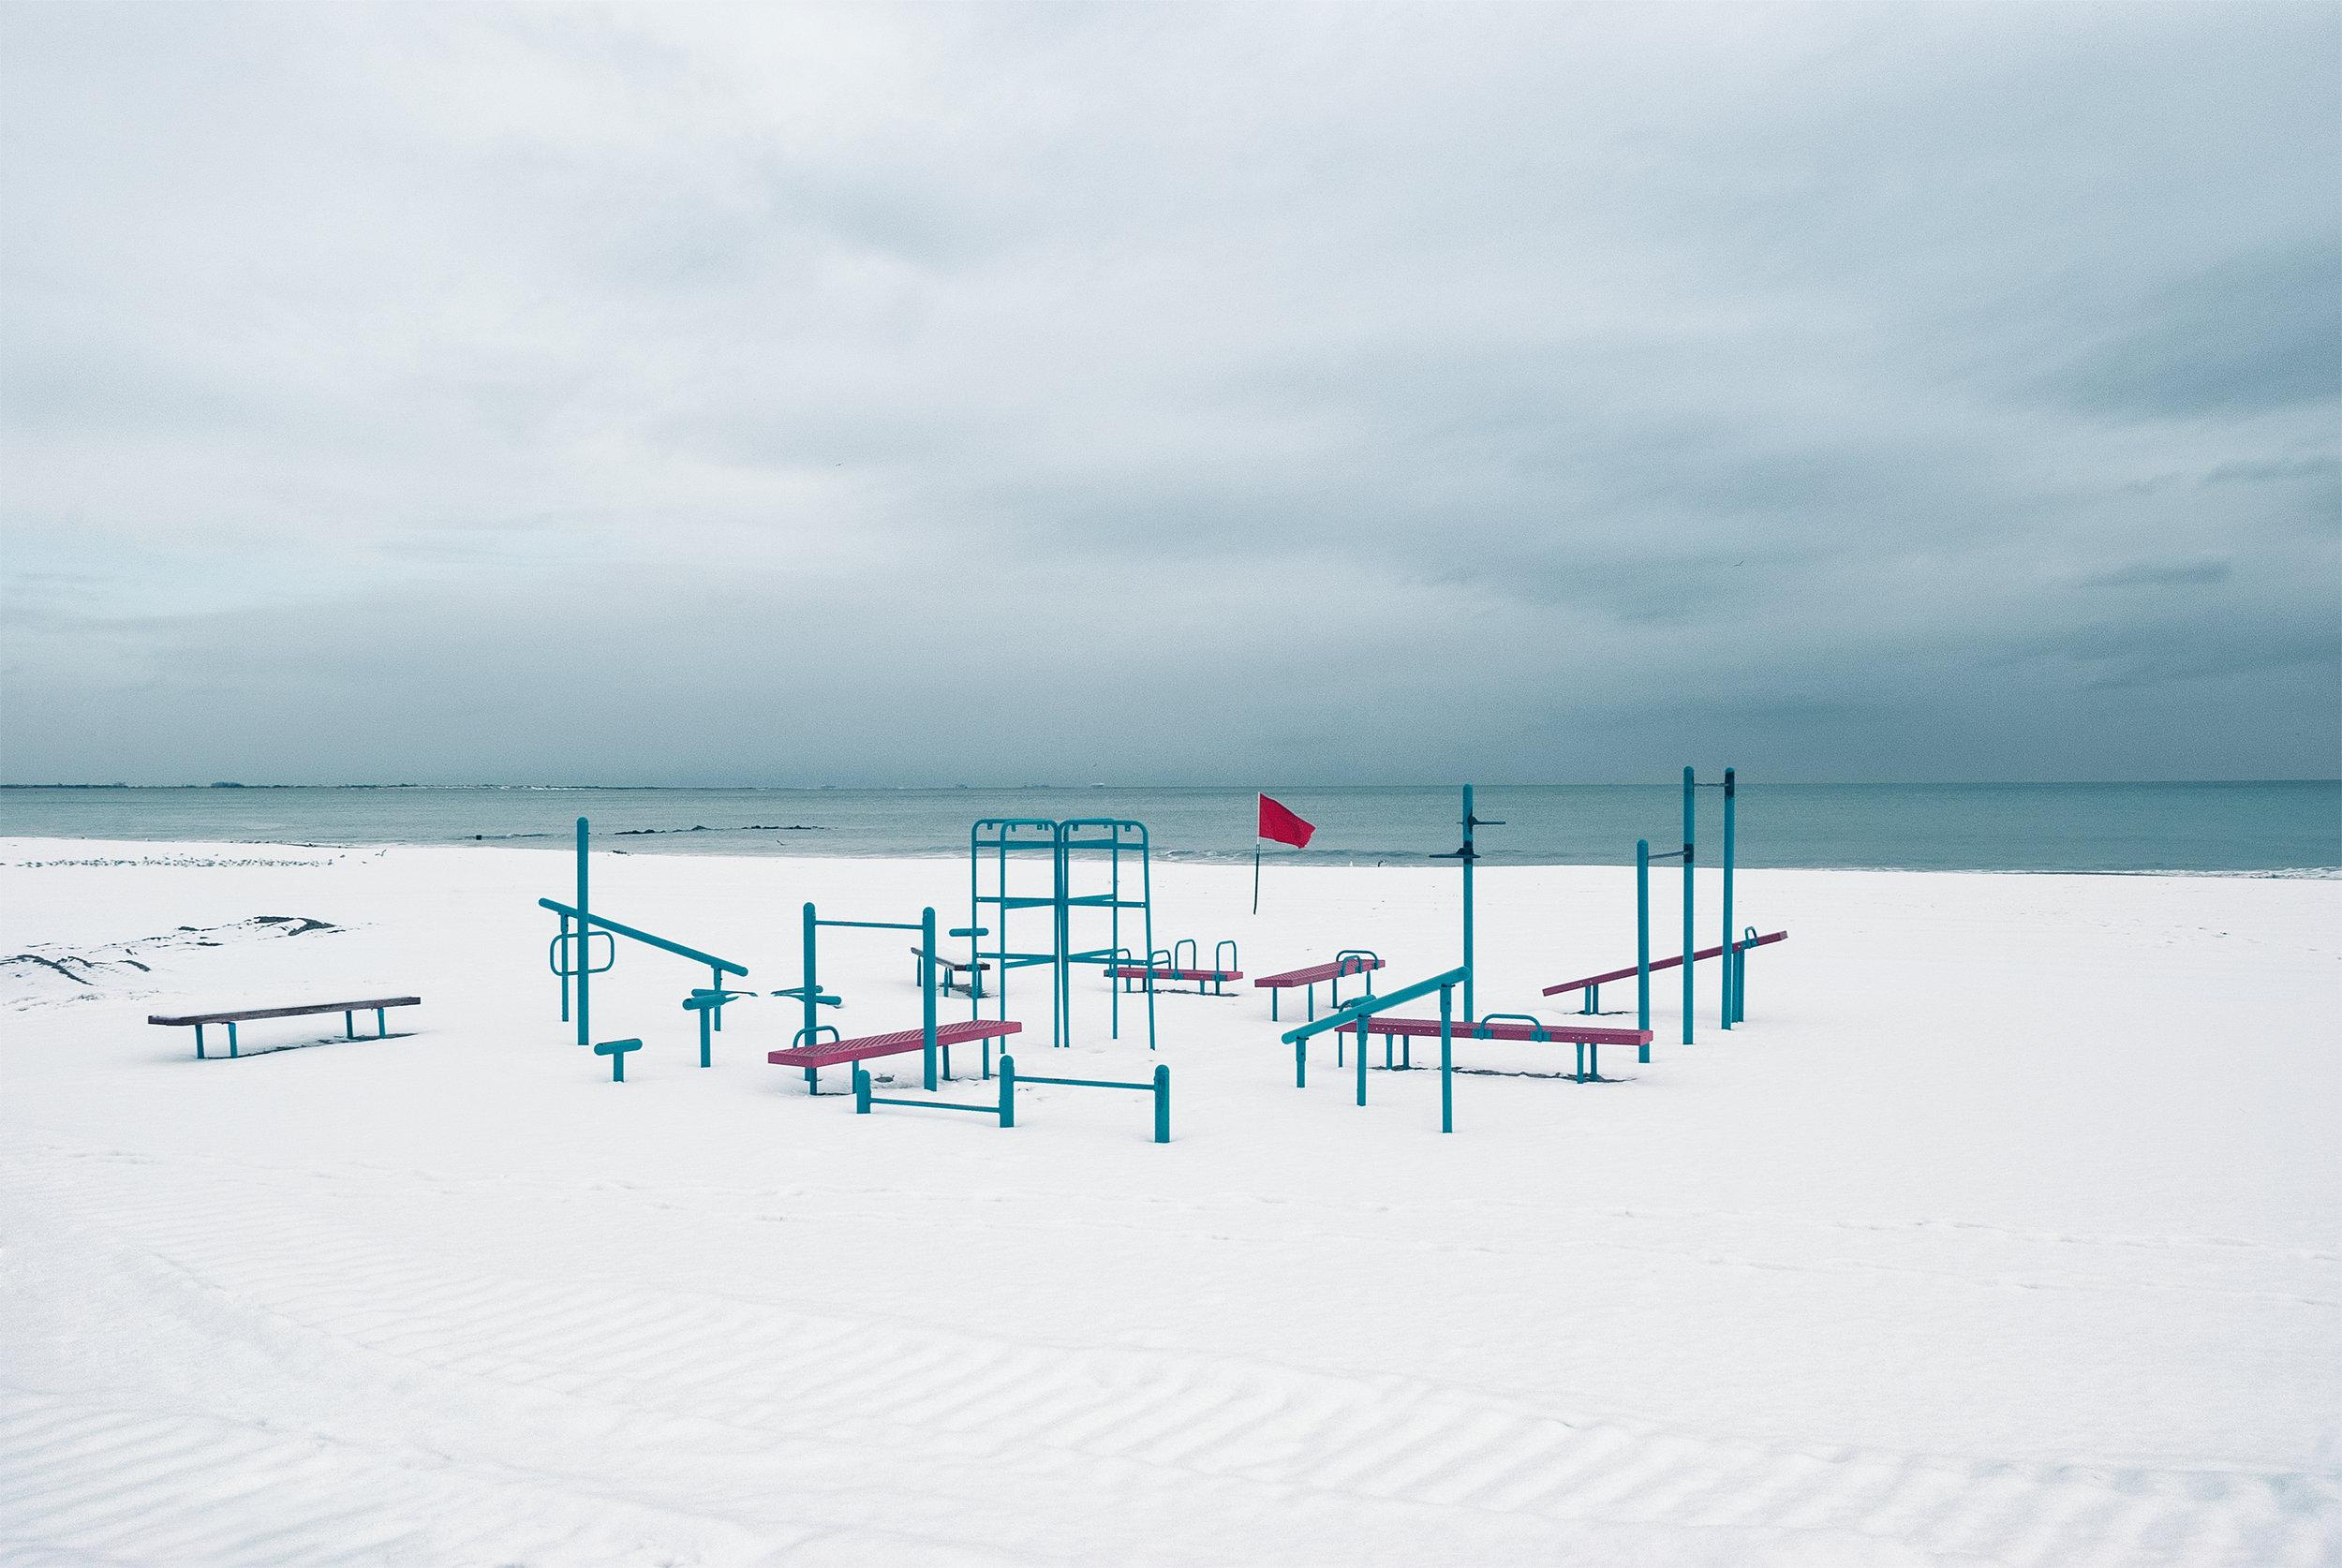 """Let's Play"". 2014 Coney Island   Photo Winner of the Photography Prize 2015  Centro de la Imagen Santo Domingo, Dominican Republic"